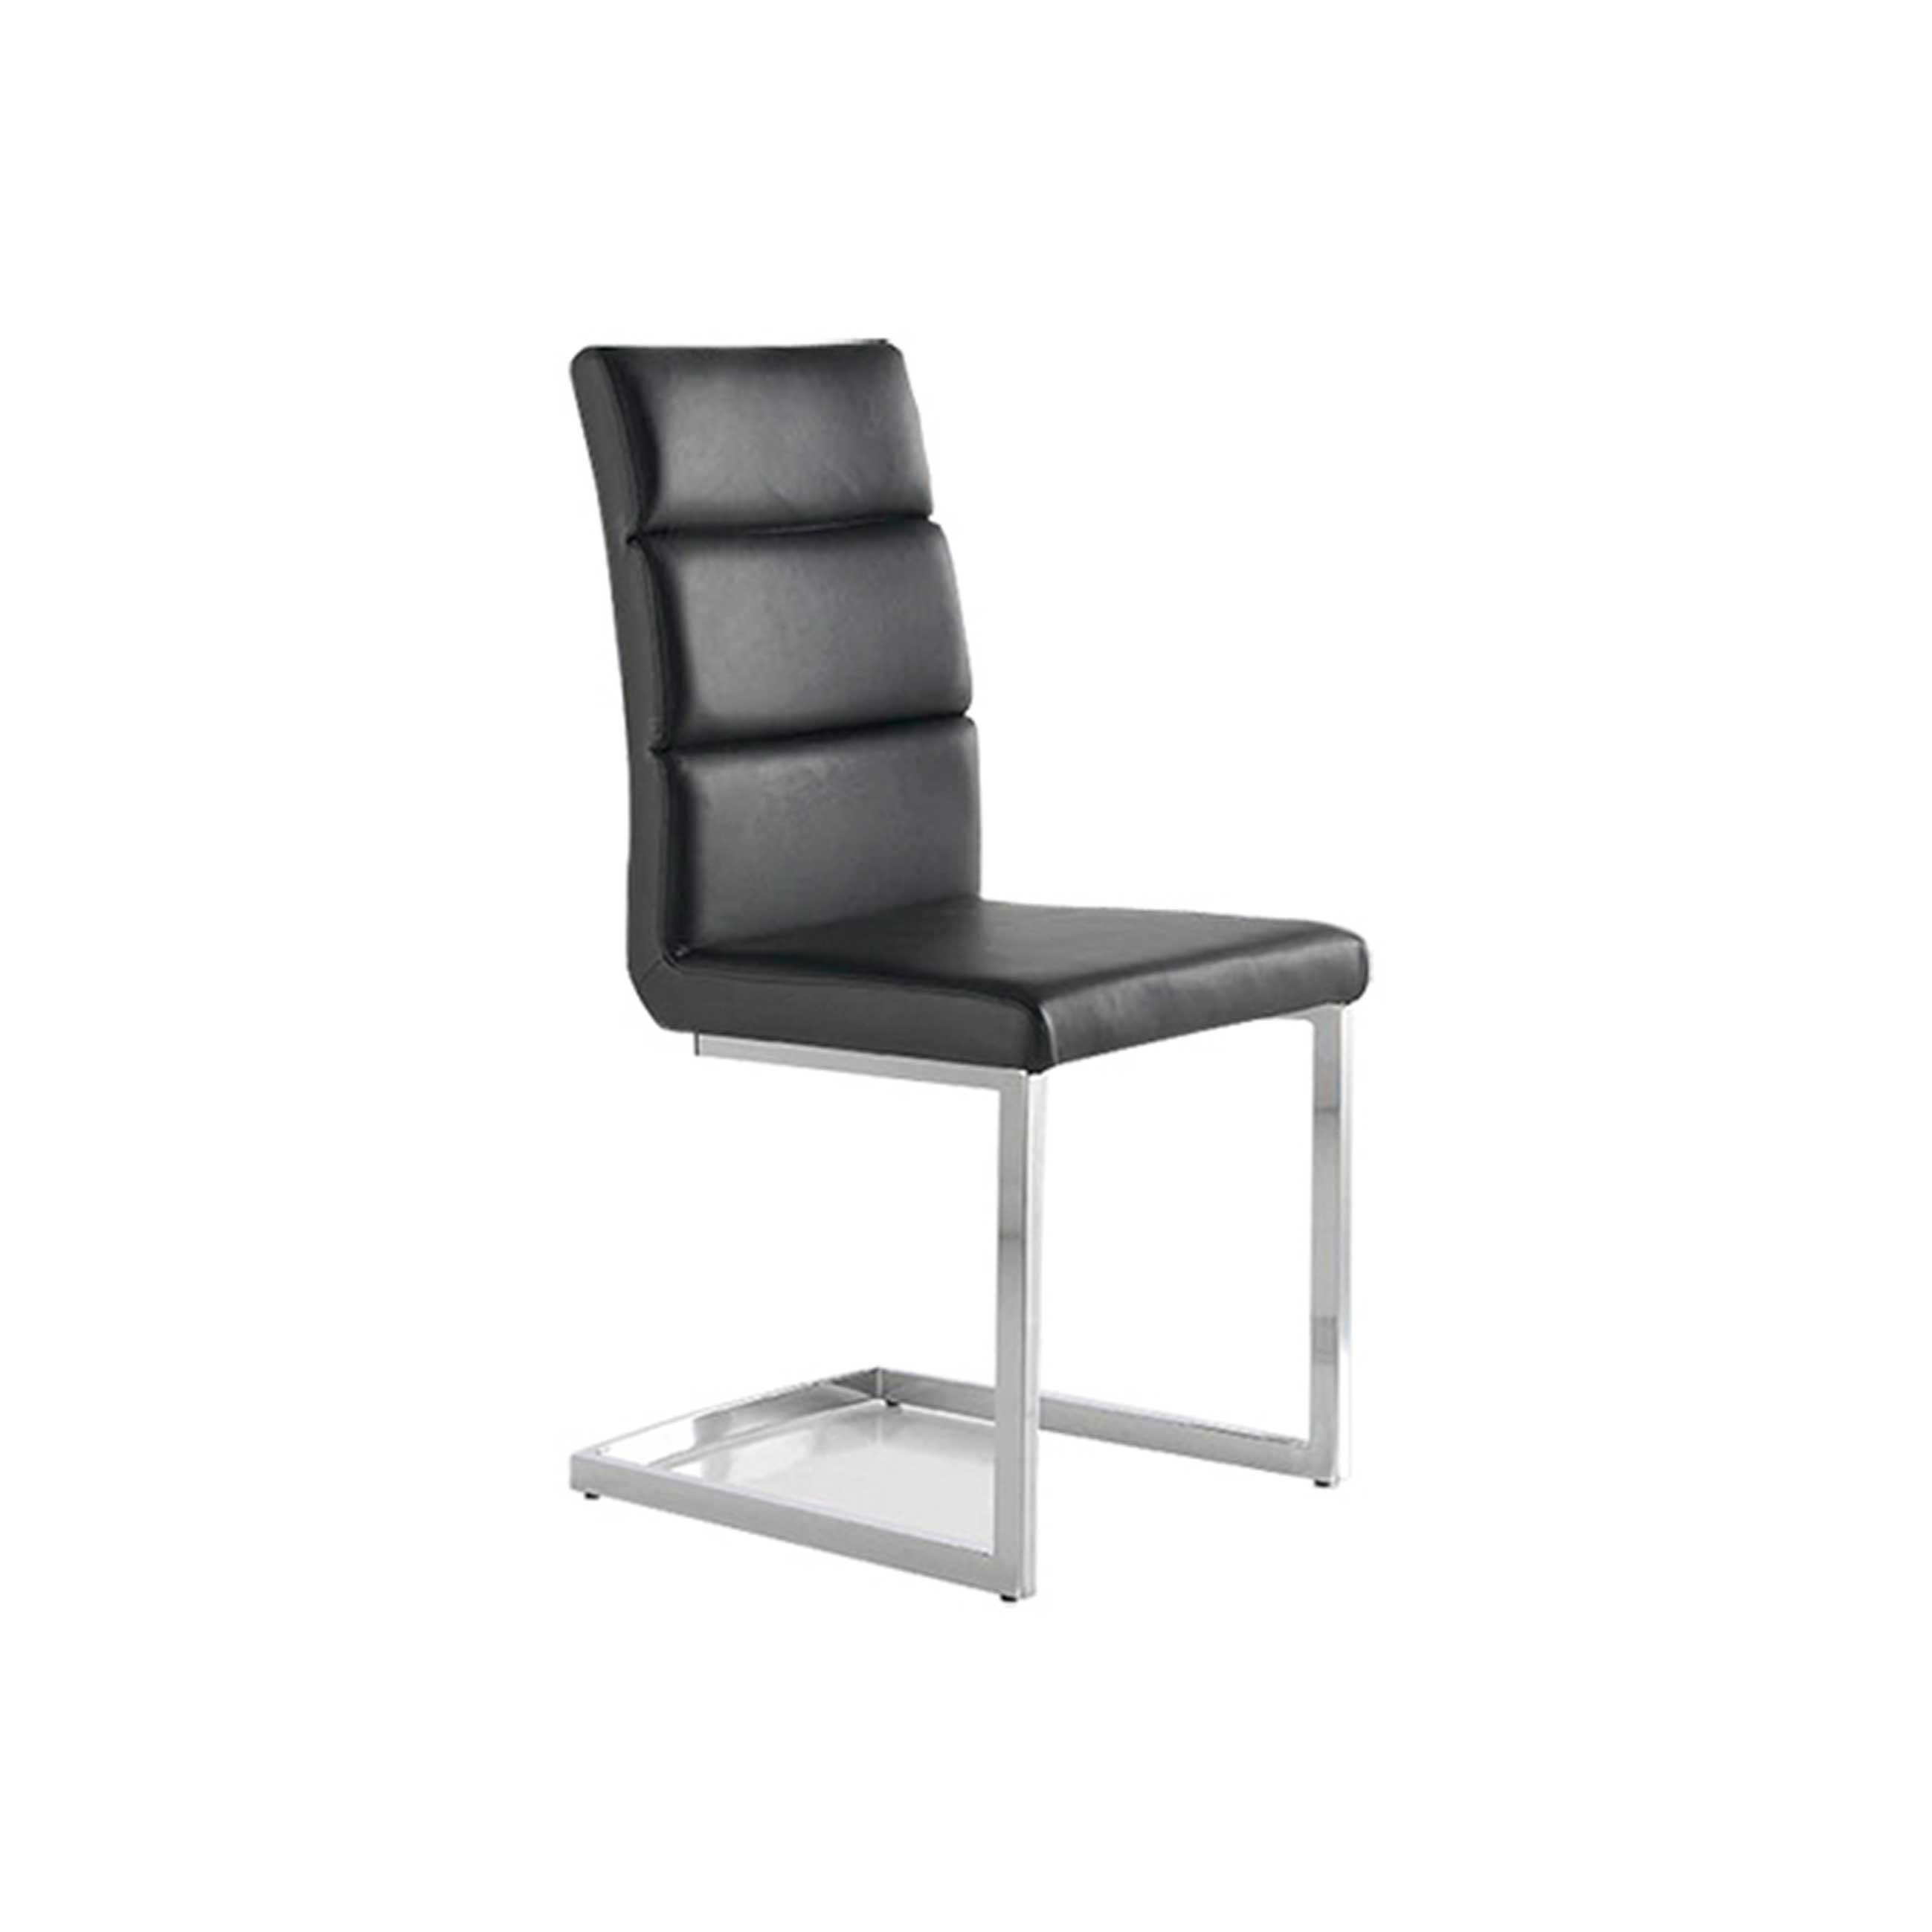 Pack 4 sillas polipiel color negro mod. Milo